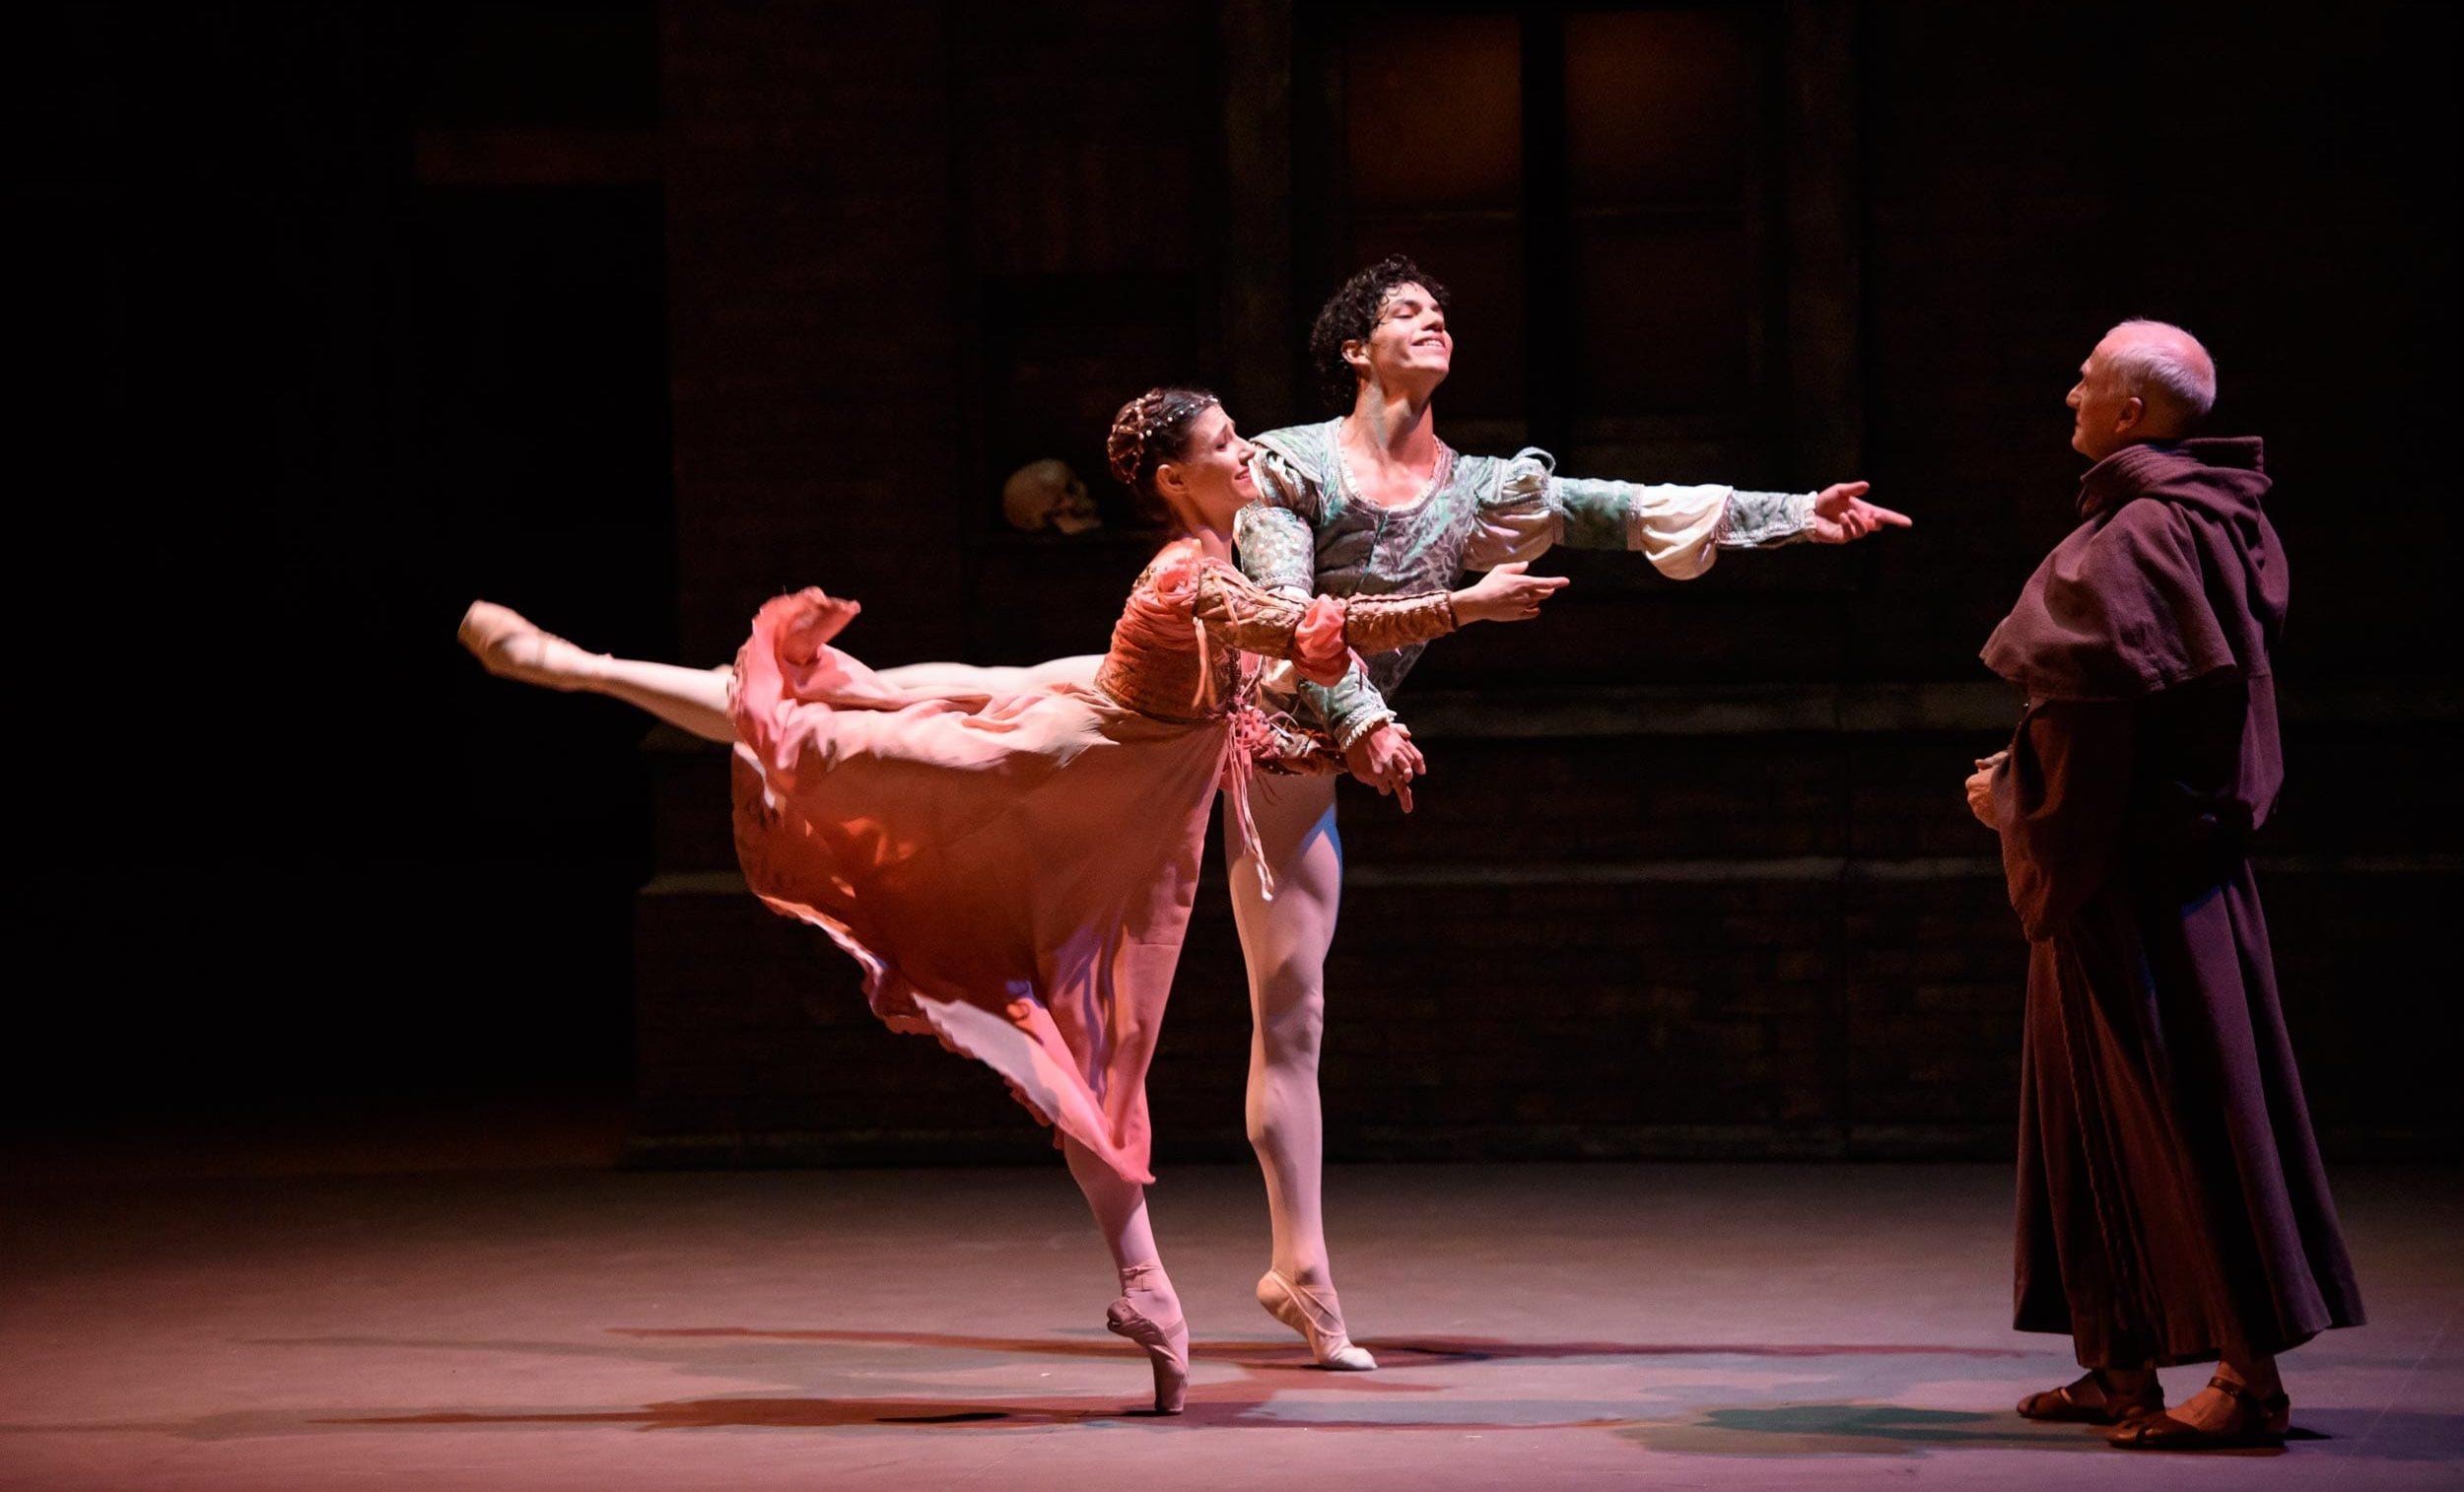 Alina-Cojocaru-and-Isaac-Hernandez-in-Romeo-&-Juliet-©Bill-Cooper